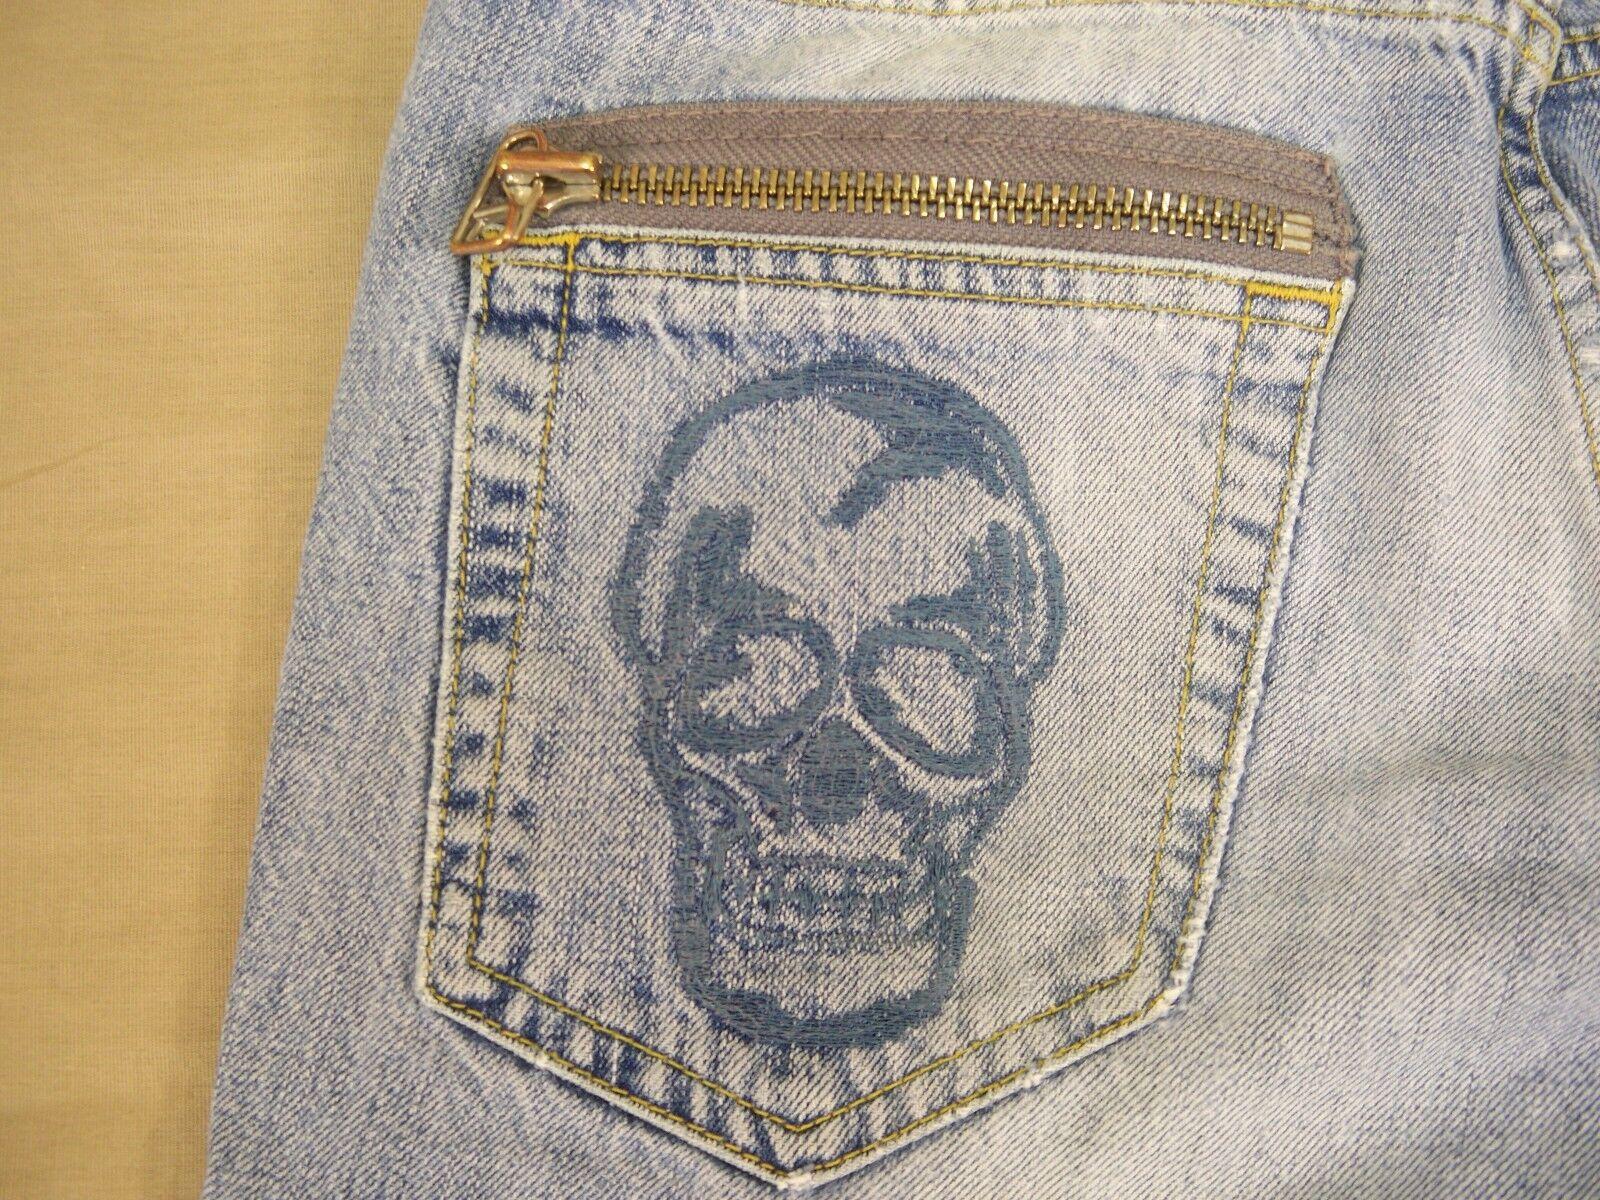 Zara Graphics Jeans Distressed Regular Fit Men's Size 30 X 30